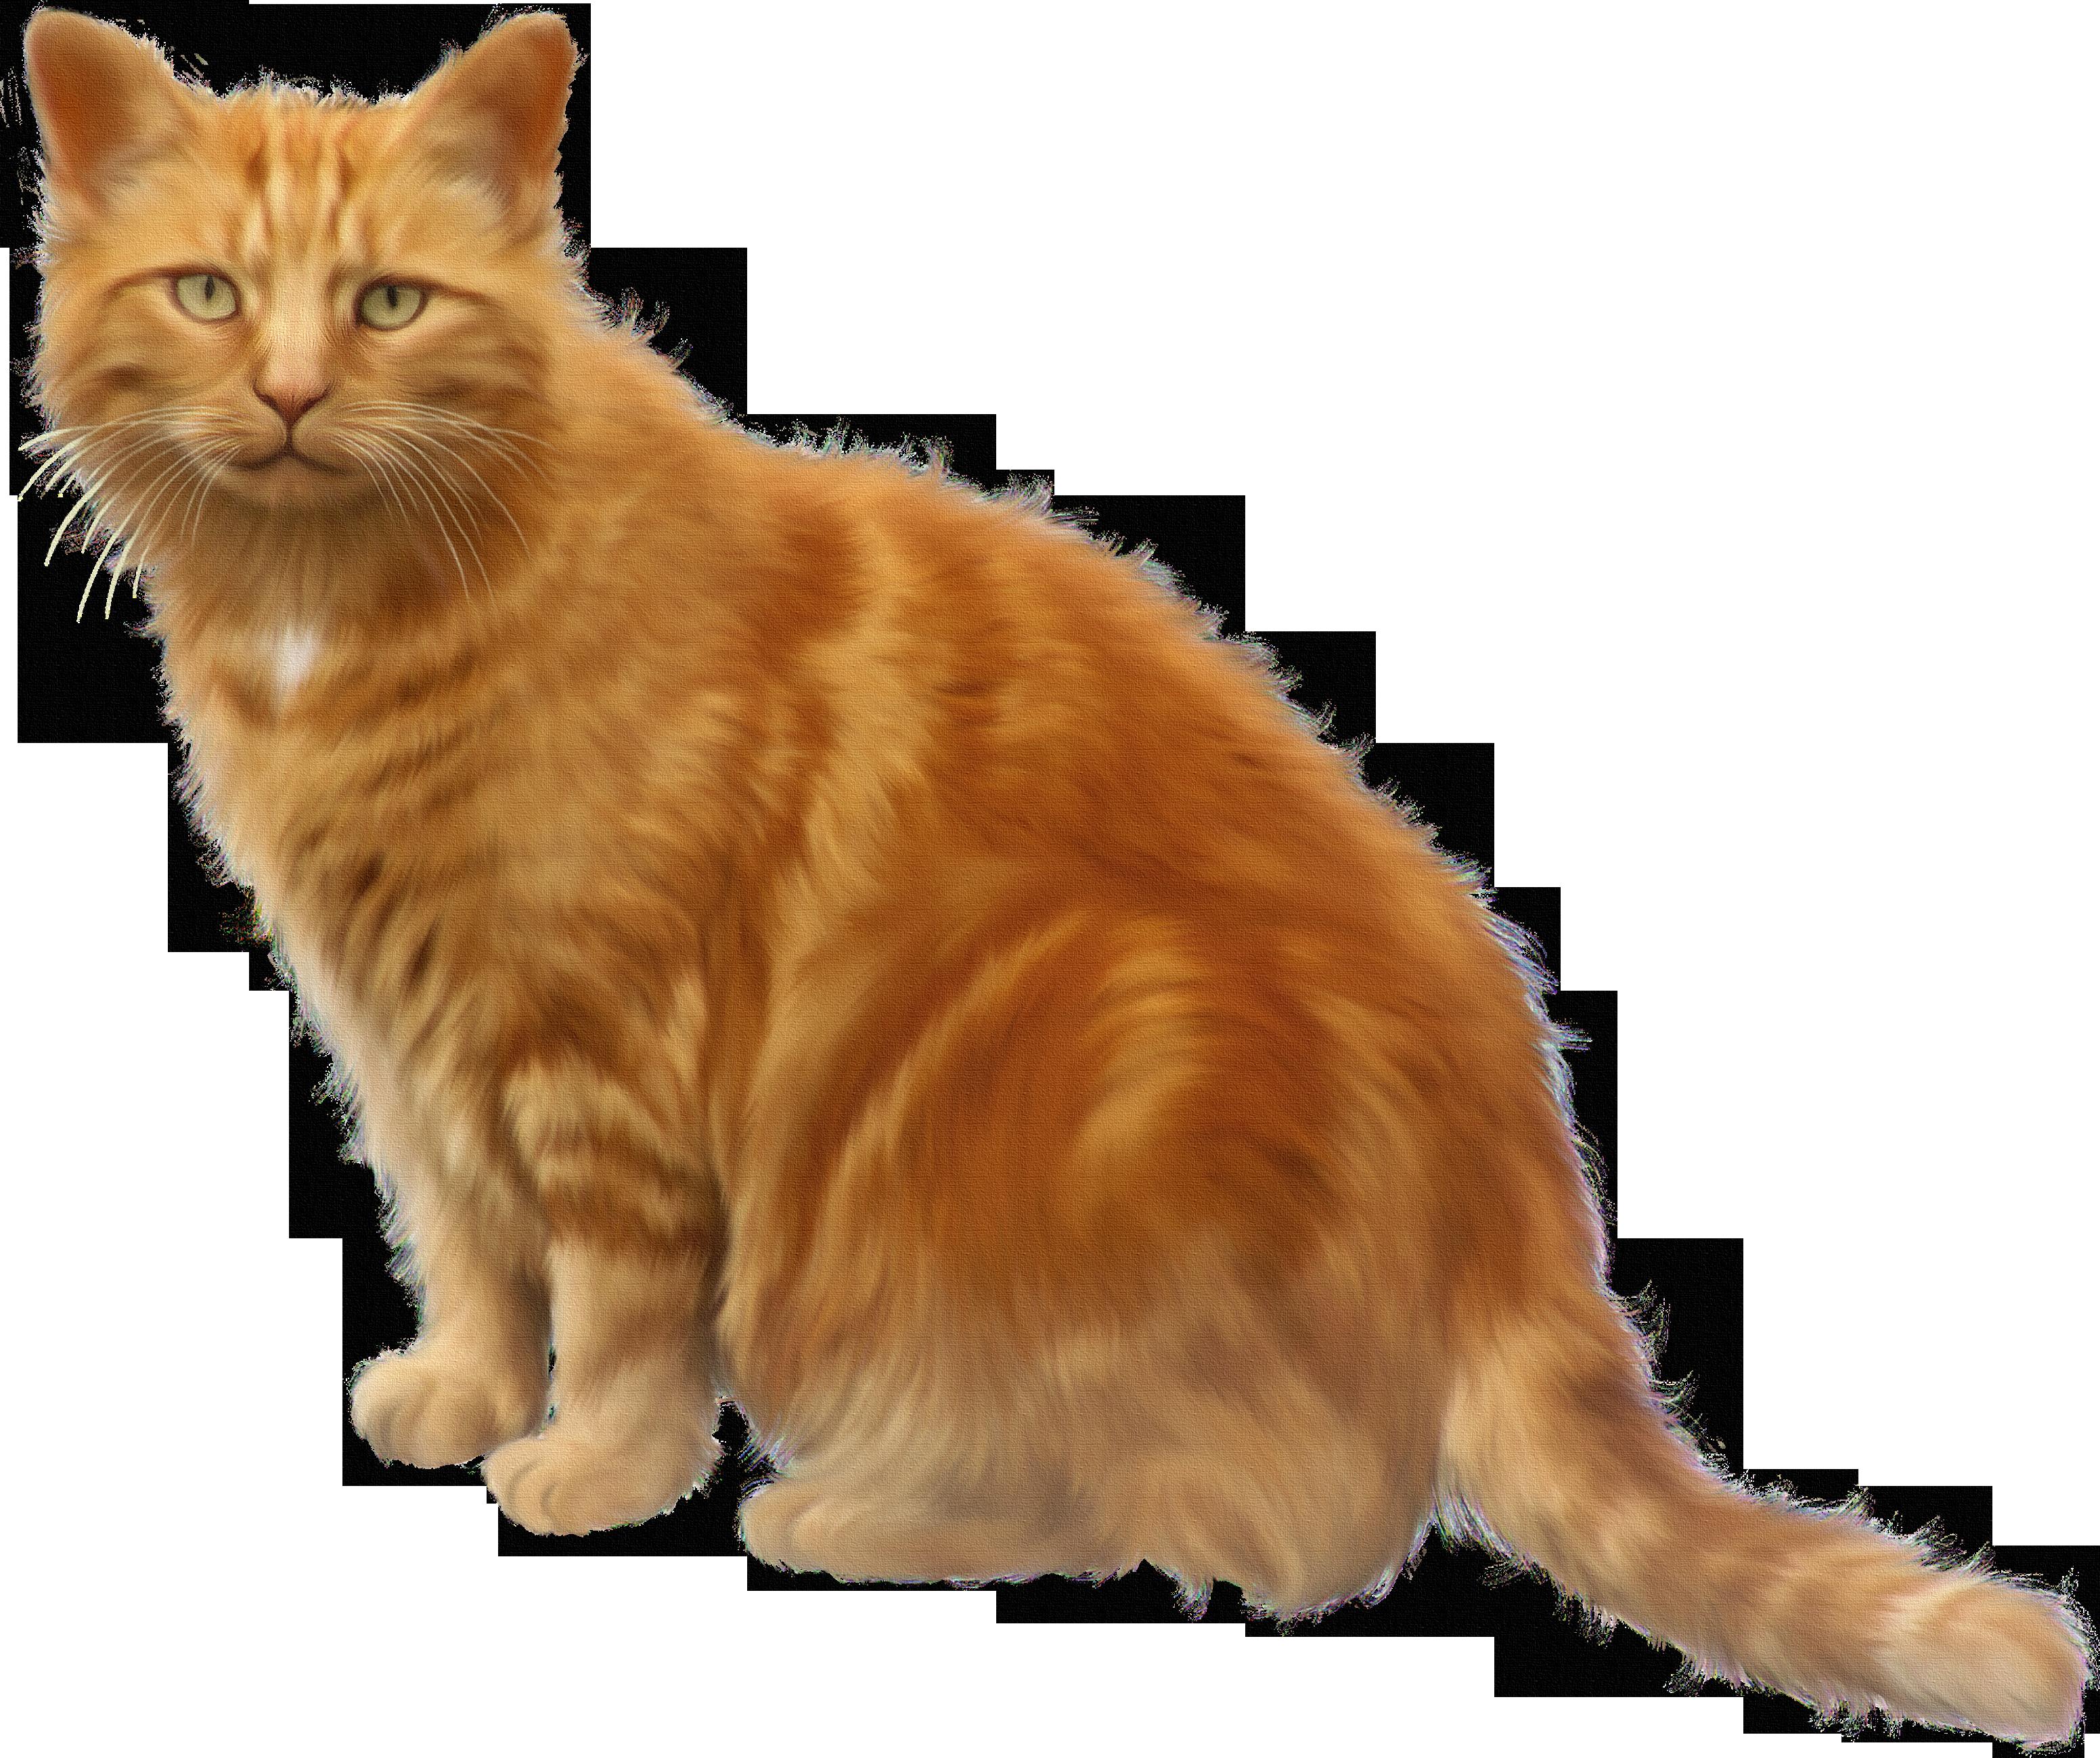 Orange and black cat clipart banner freeuse stock Kurilian Bobtail Black cat Clip art - Transparent bottom cat 3103 ... banner freeuse stock